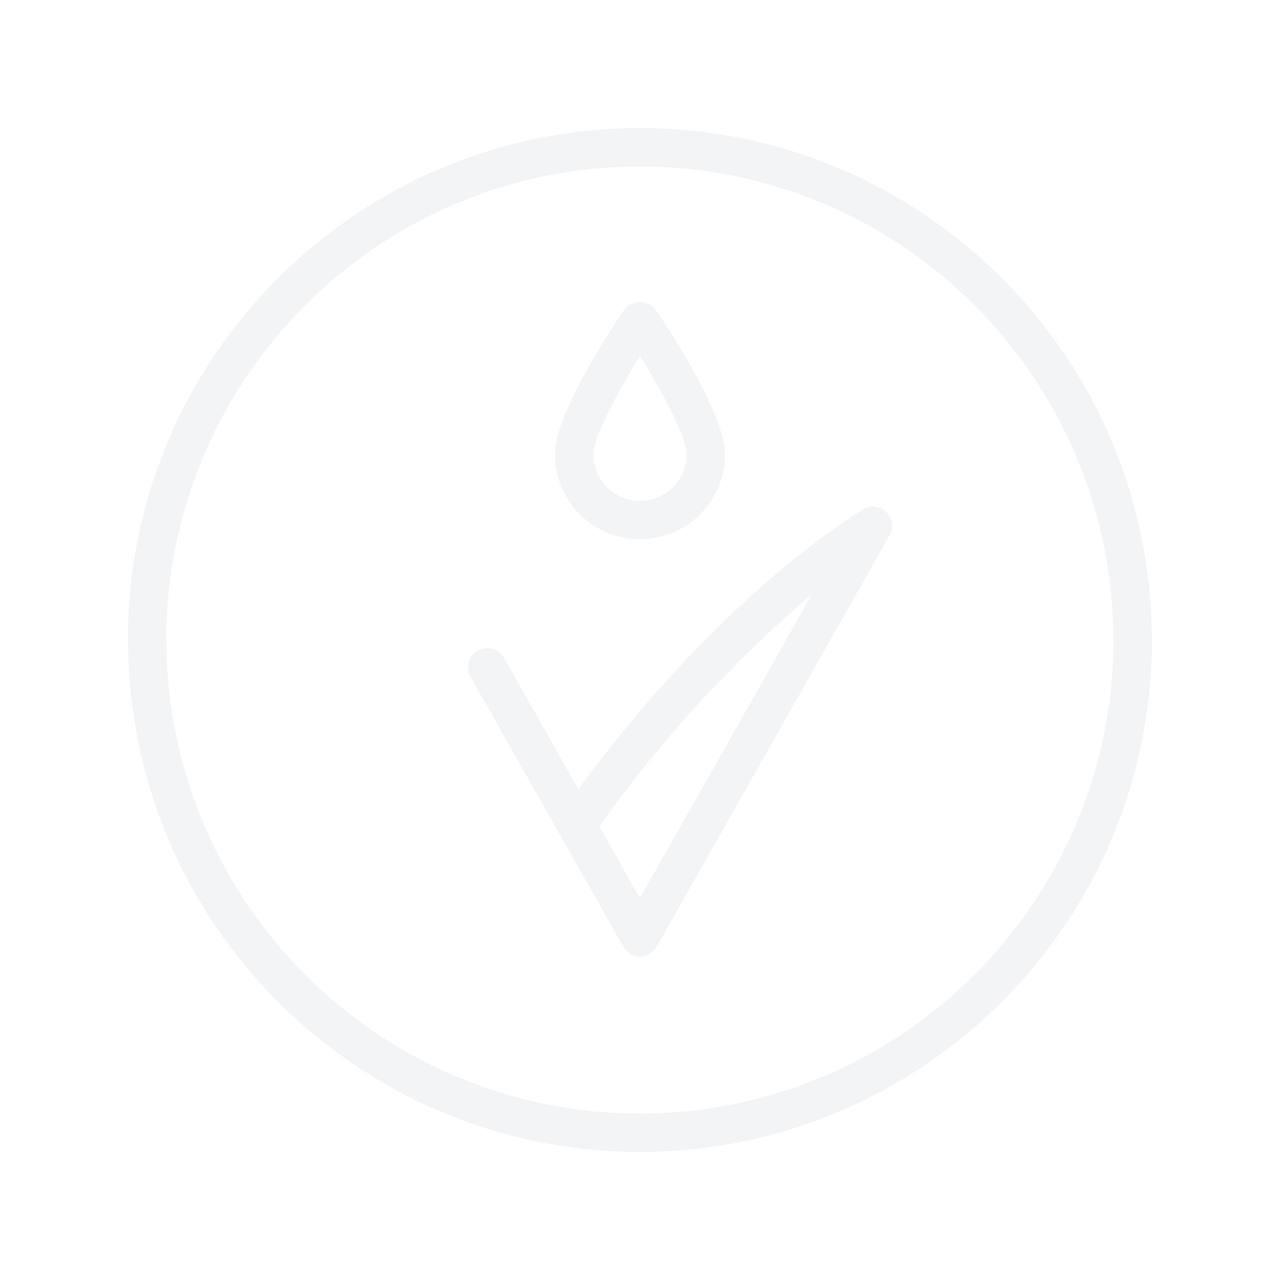 MUA Luxe Colour & Correct Balancing Kit комплект балансировки макияжа 17g